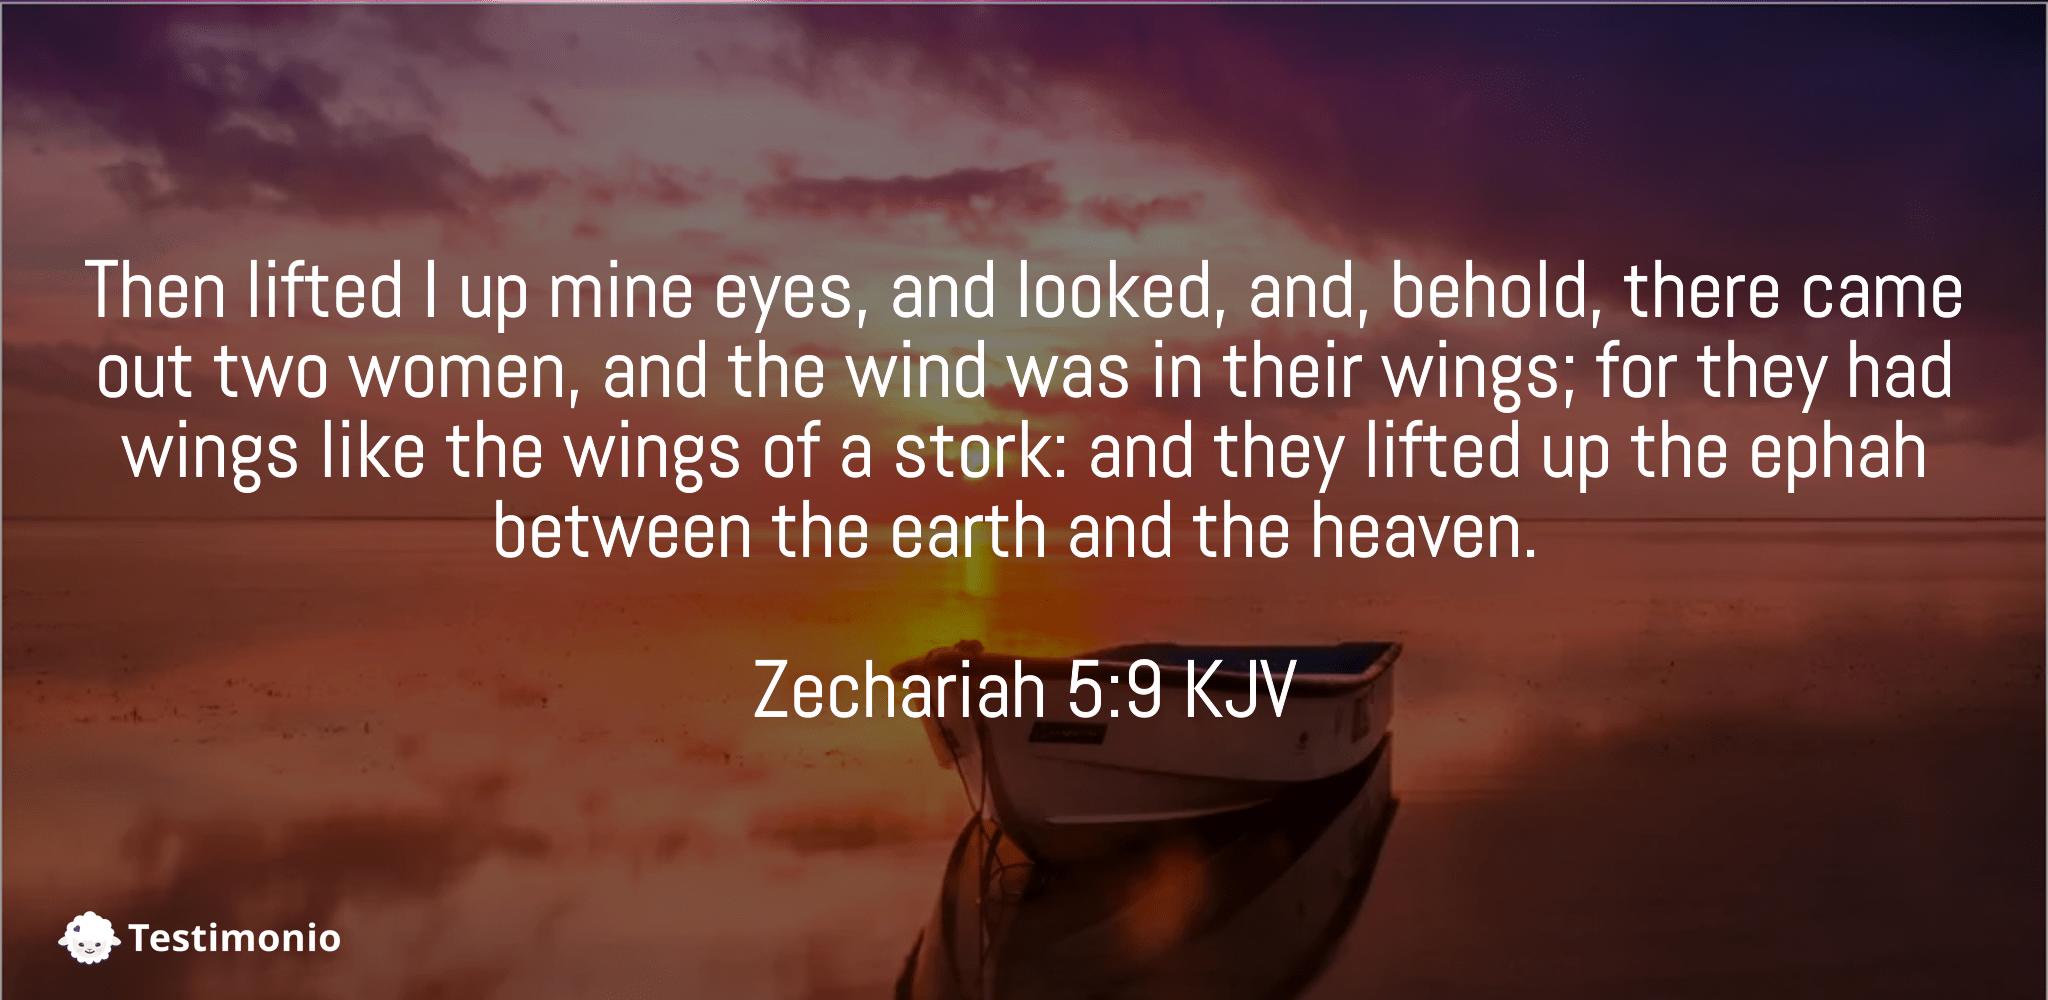 Zechariah 5:9